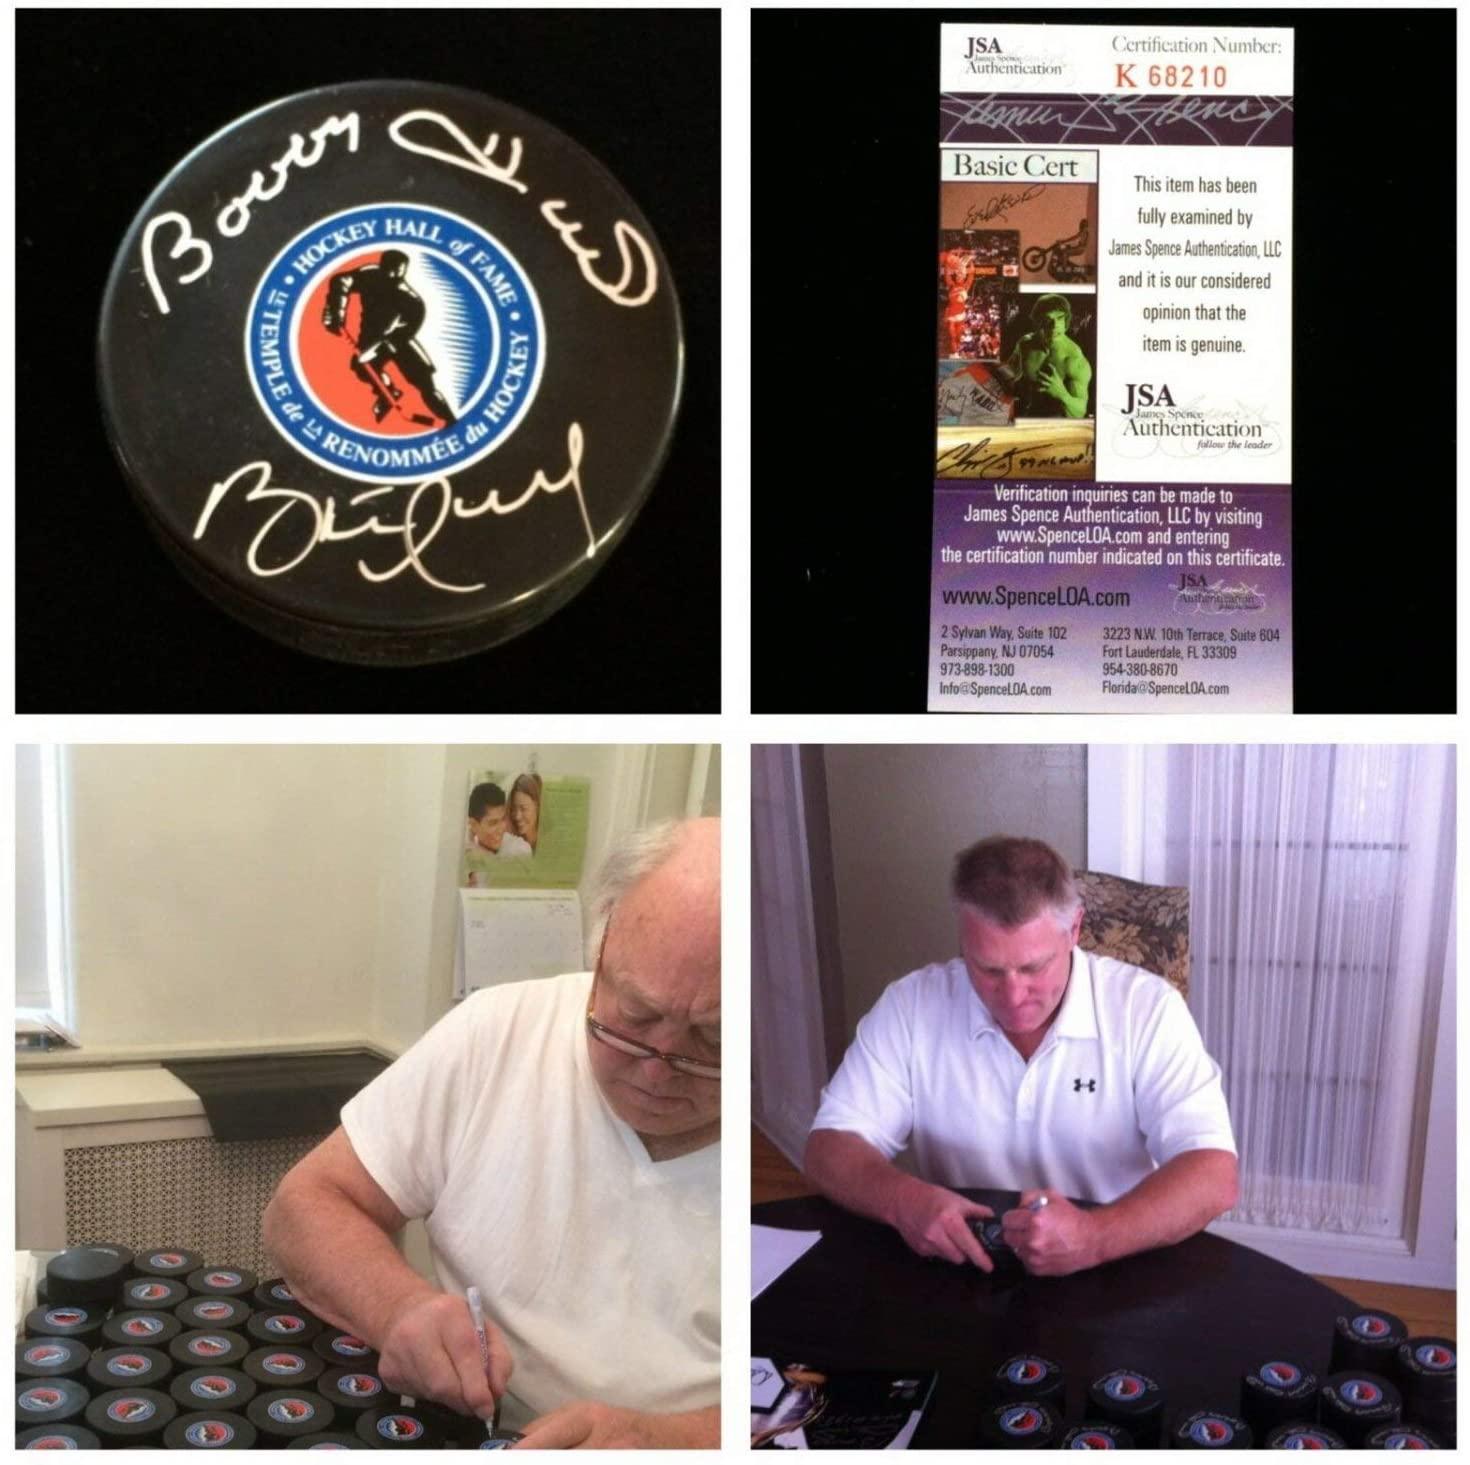 Bobby Hull Autographed Signed Brett Hull Chicago Blackhawks Autograph Hockey Puck JSA